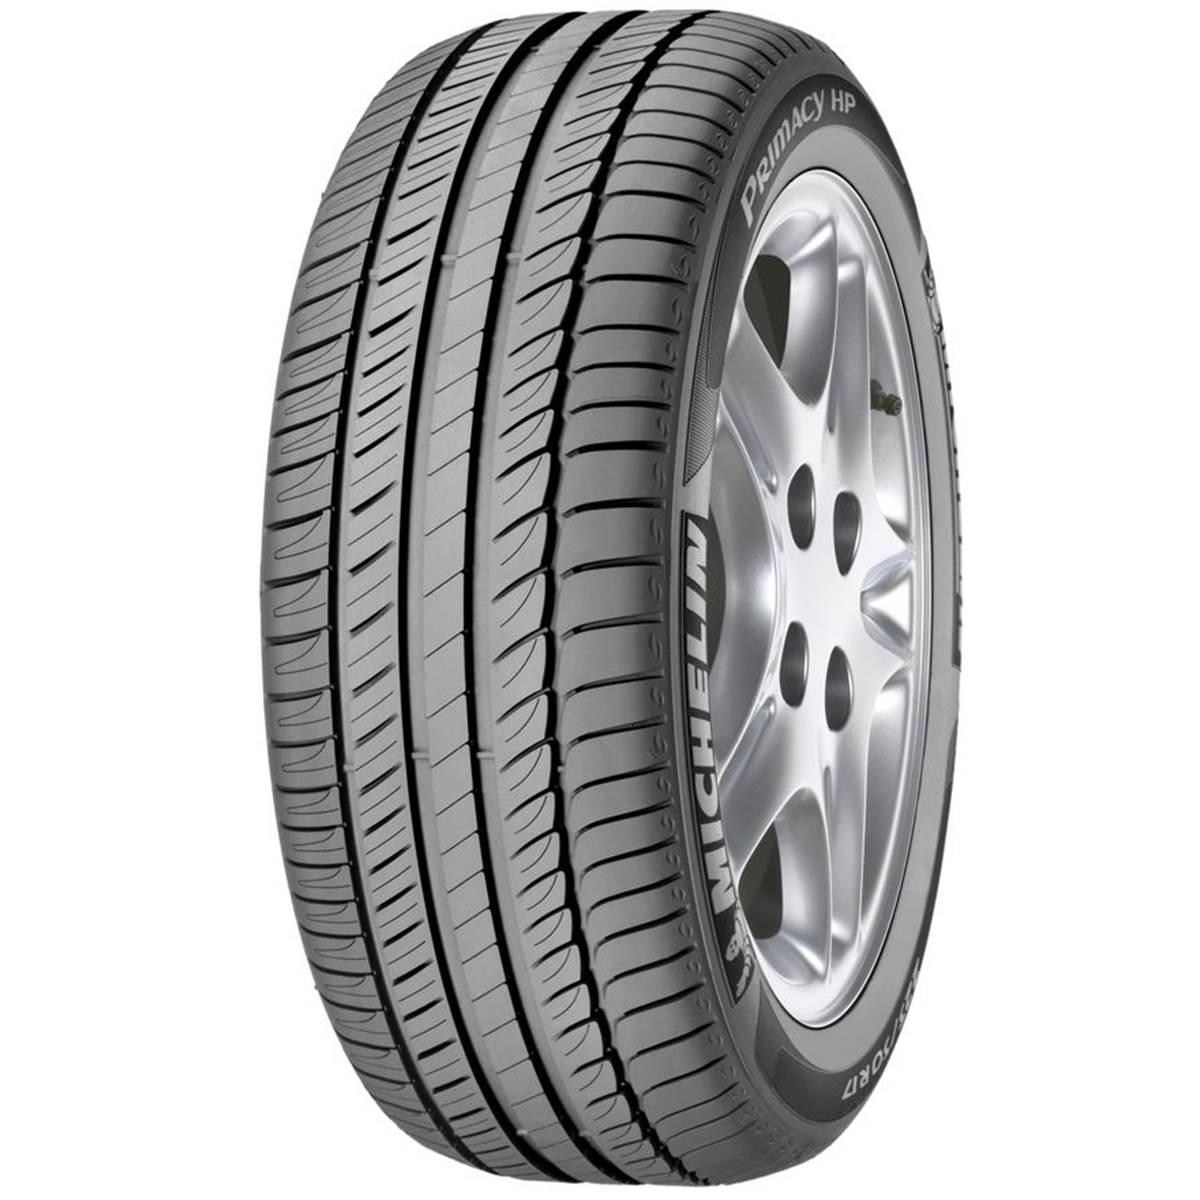 Pneu Michelin 225/50R17 94Y Primacy Hp